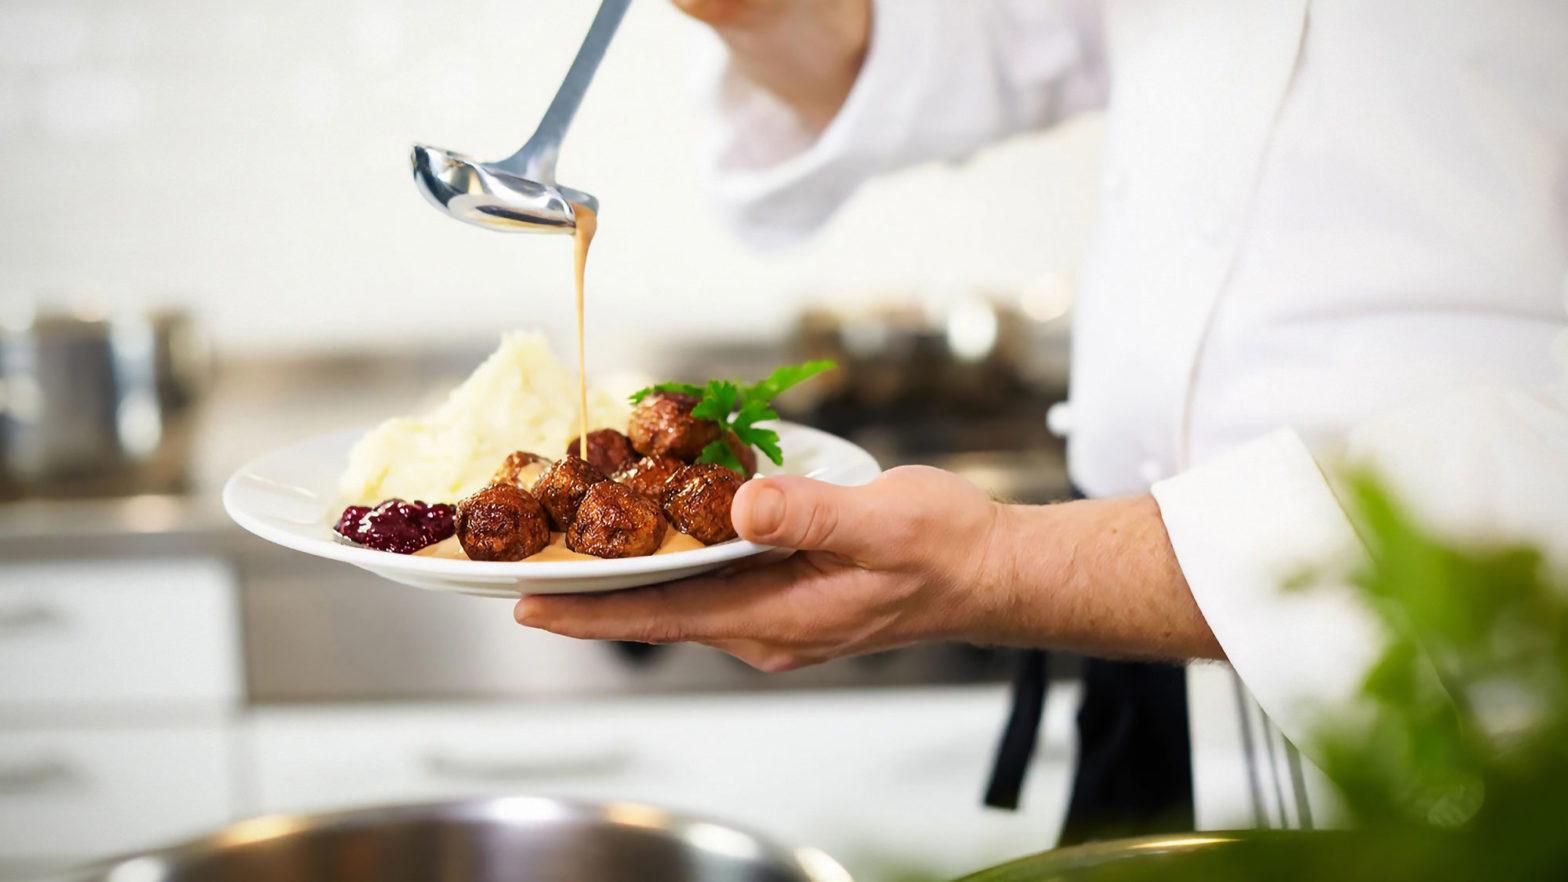 IKEA Shares Its Swedish Meatball Recipe